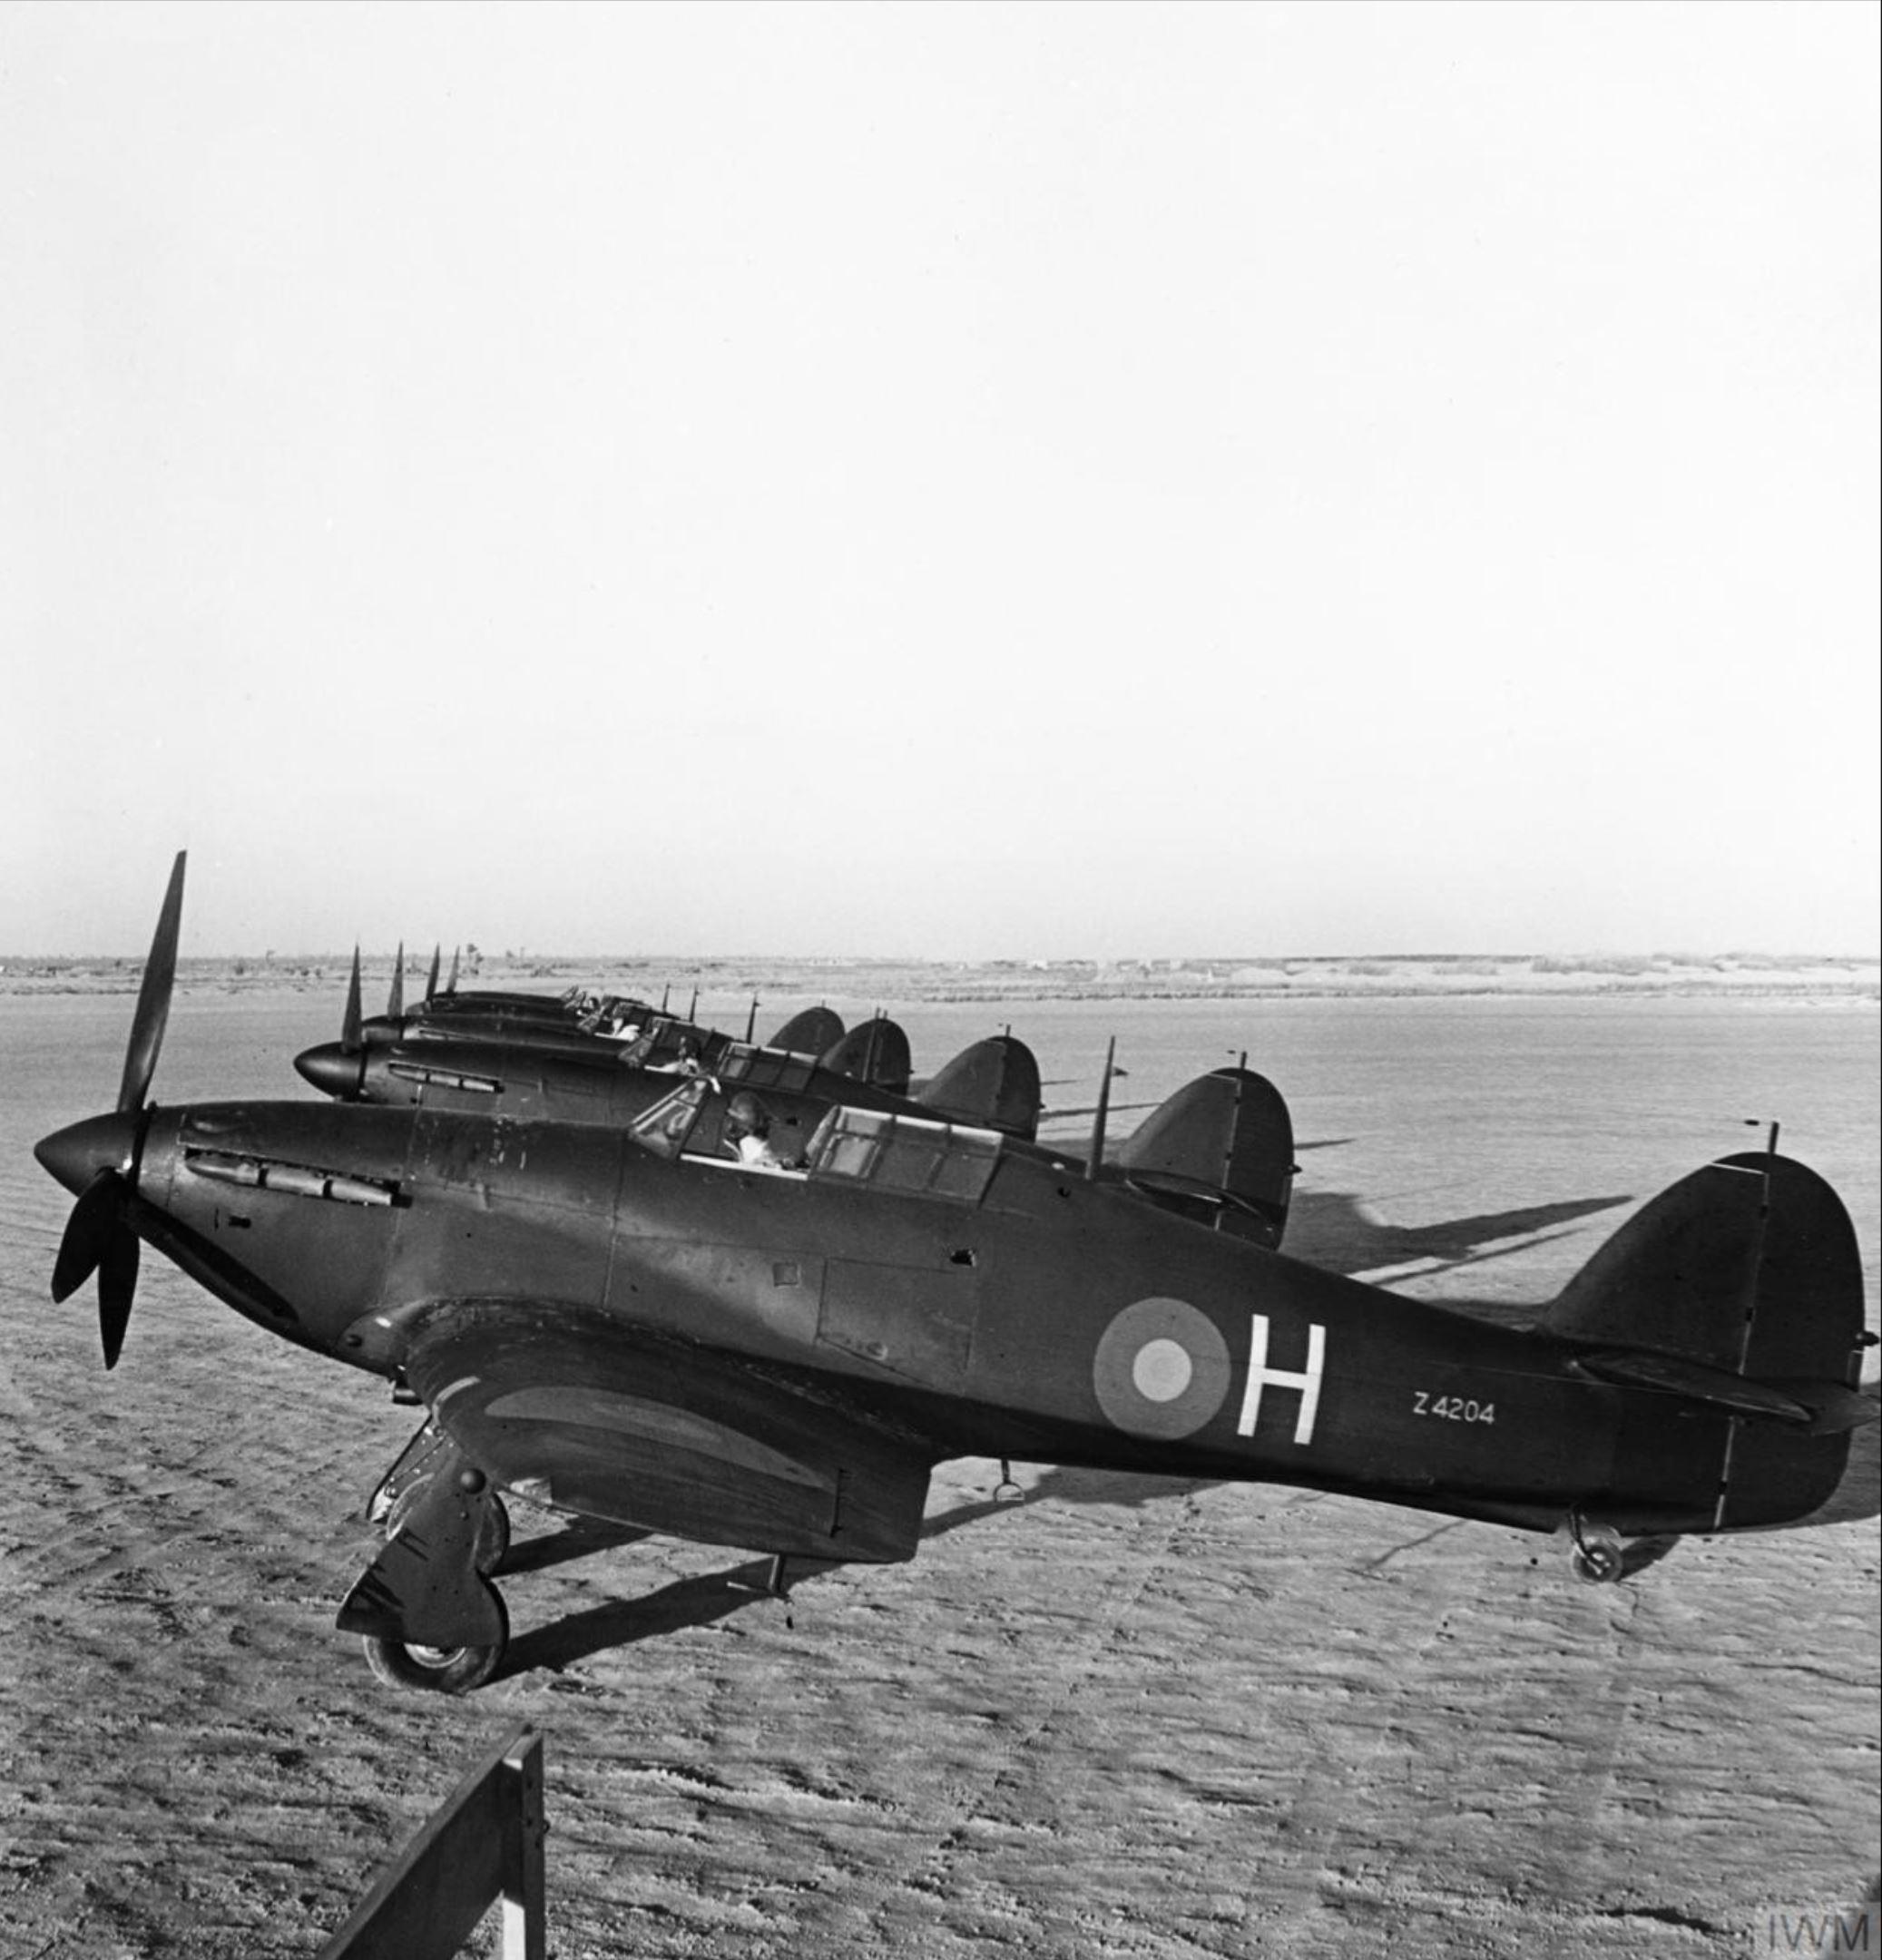 Nightfighter Hurricanes RAF 30Sqn H Z4204 based in Egypt flew night patrols over the Suez Canal IWM 01